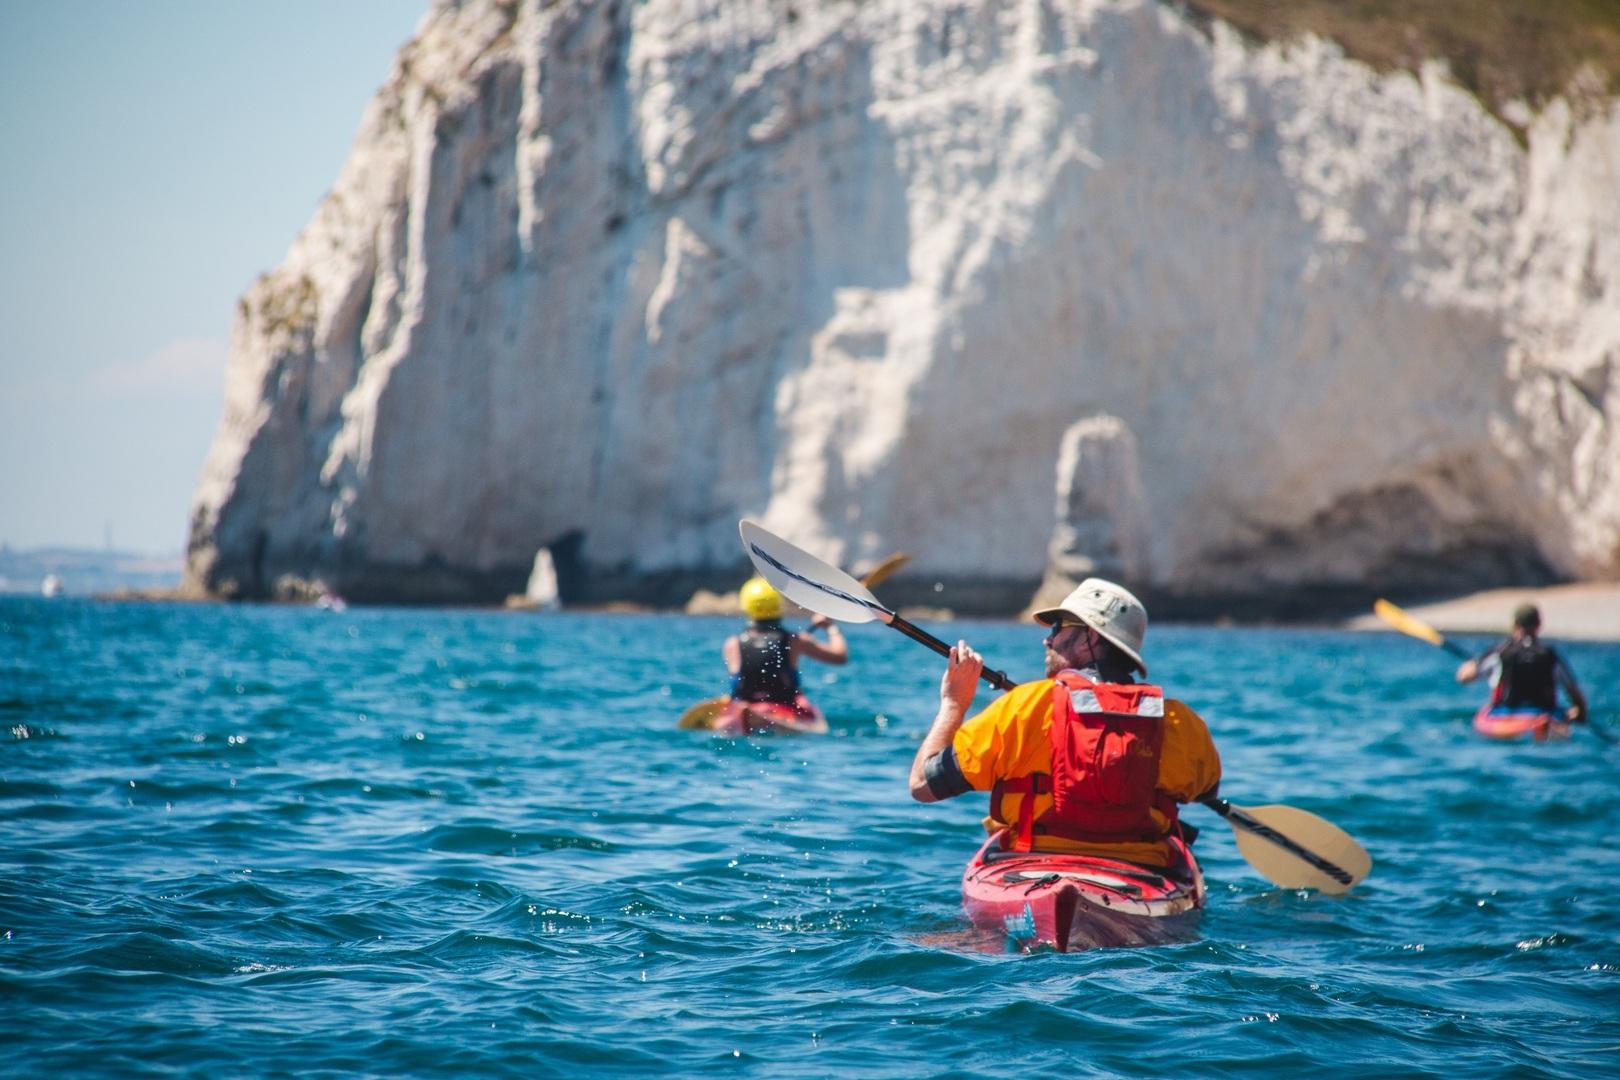 Social distancing paddling on the Dorset coast